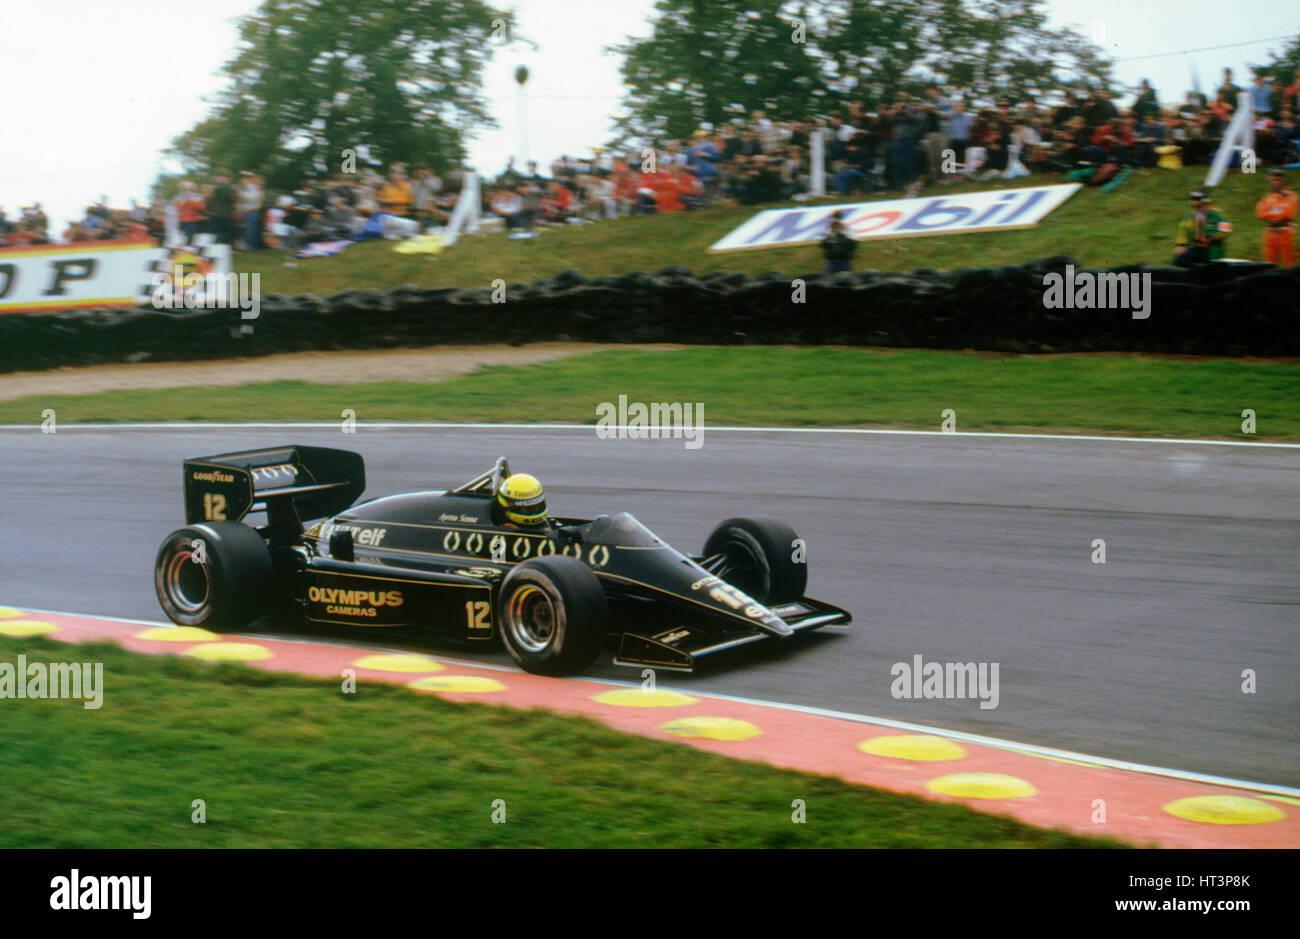 Ayrton Senna in the Lotus 97T Renault at 1985 European Grand Prix Brands Hatch Artist: Unknown. - Stock Image